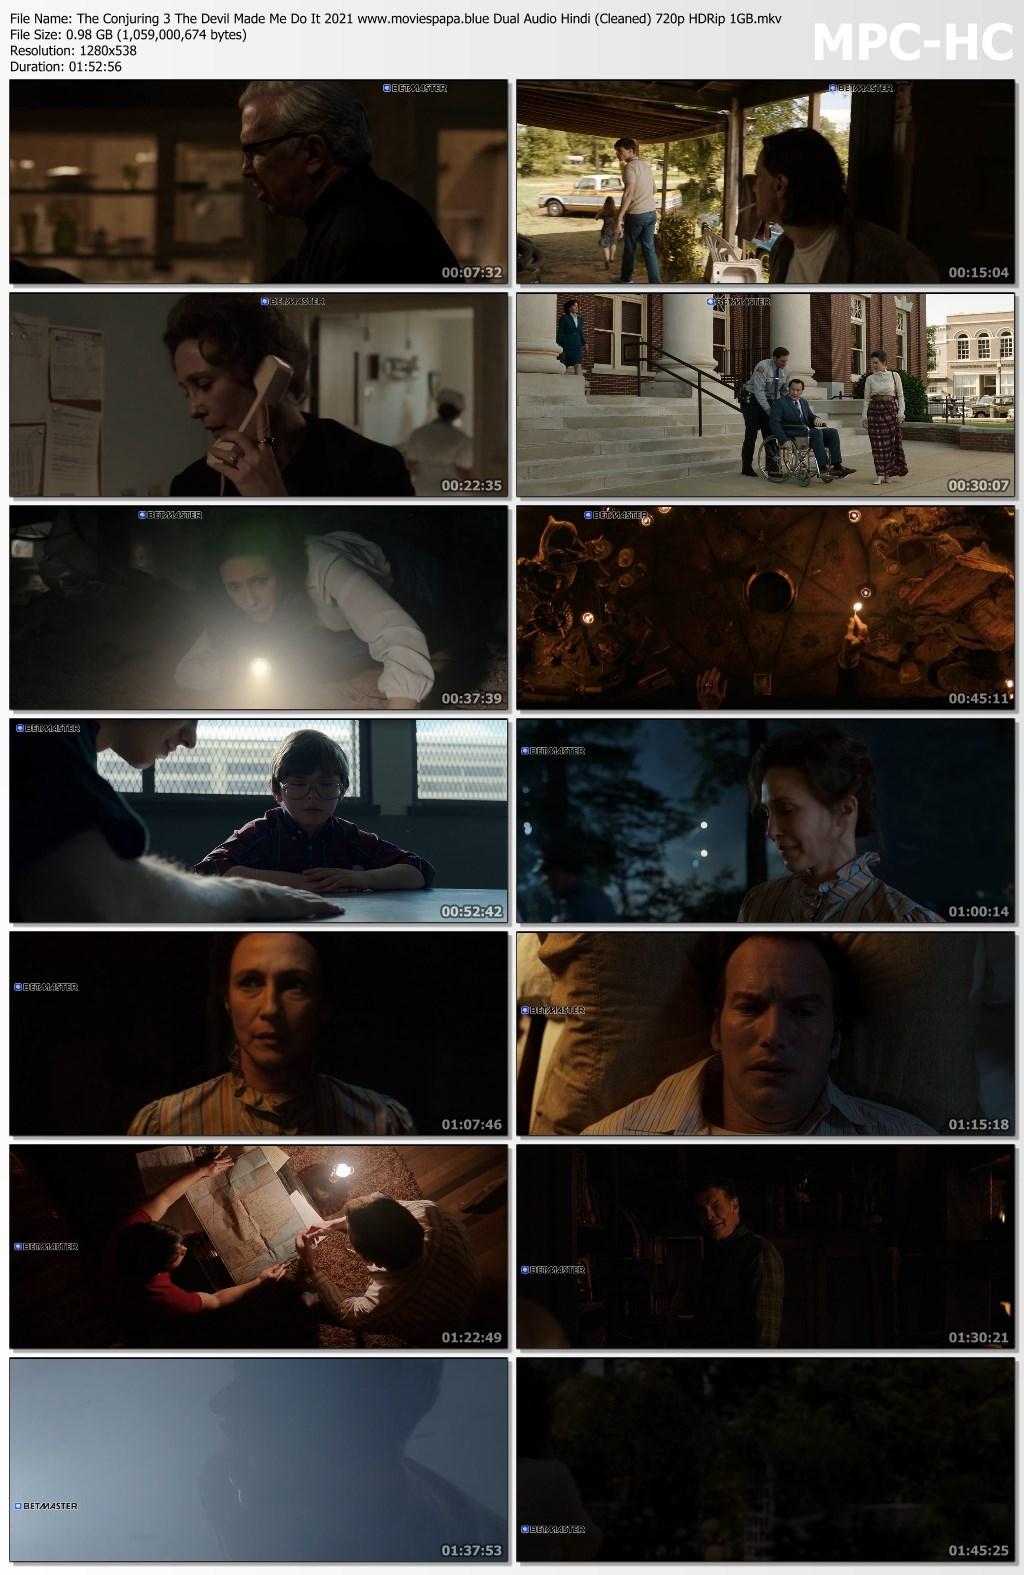 The Conjuring 3 2021 screenshot HDMoviesFair